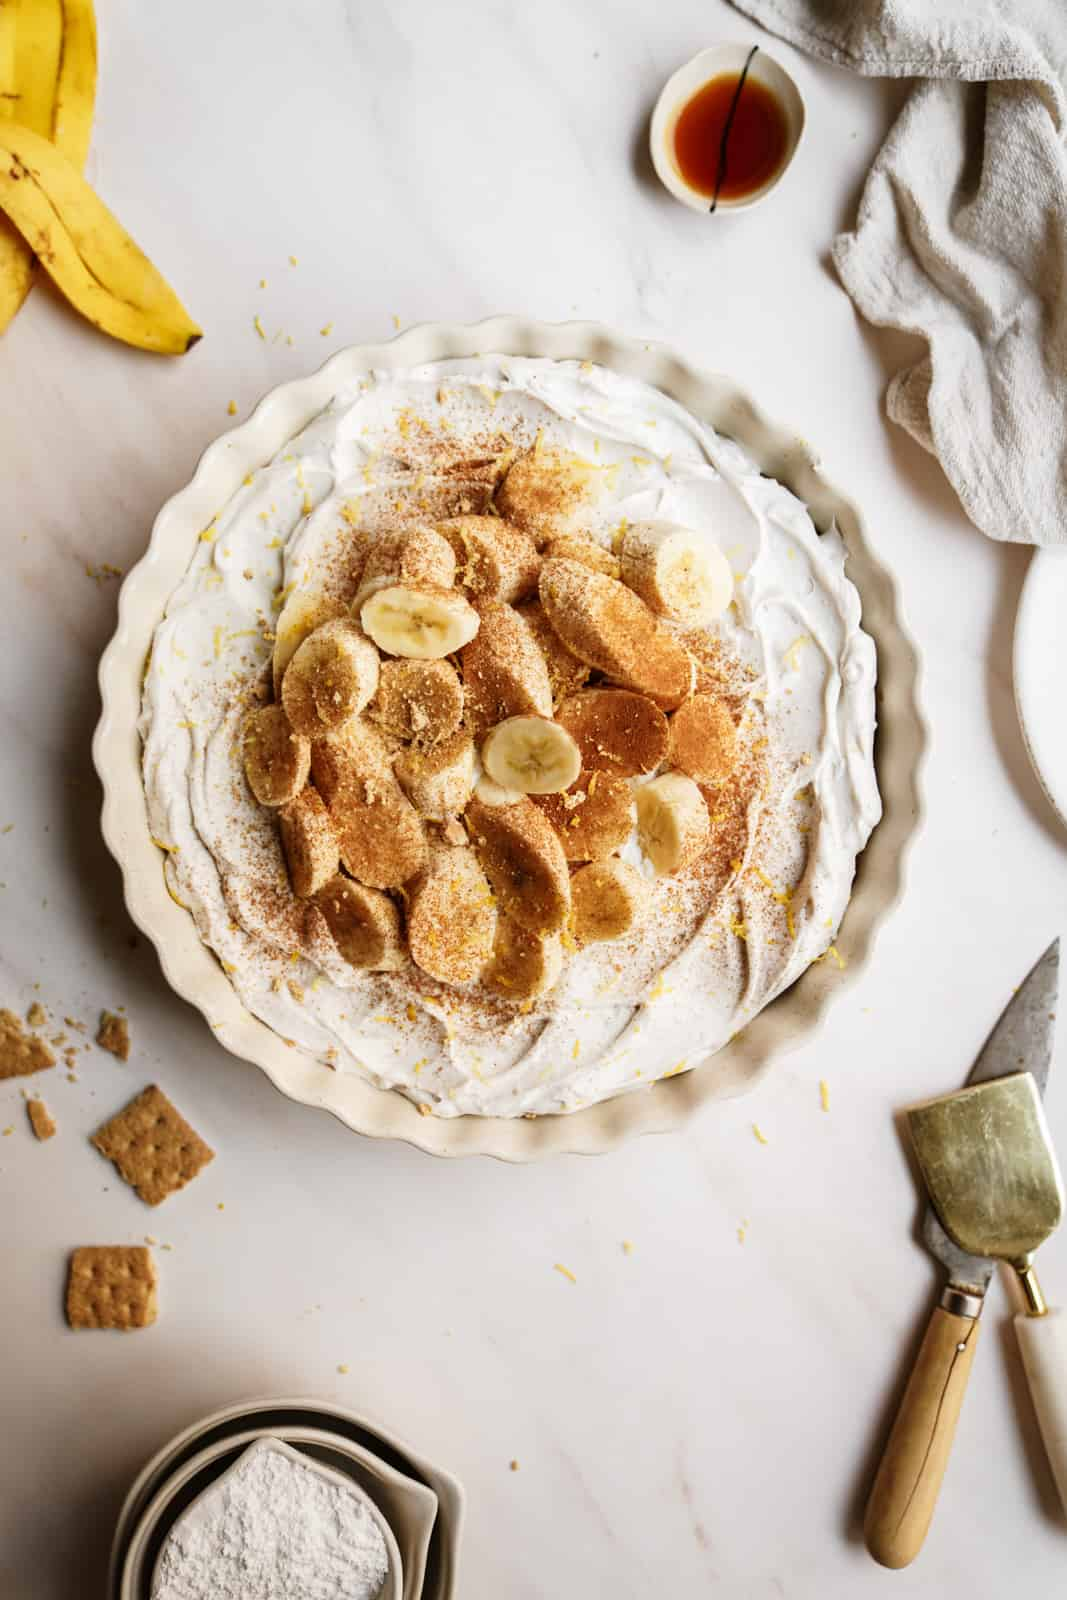 Easy vegan banana cream pie on countertop with fresh bananas on top